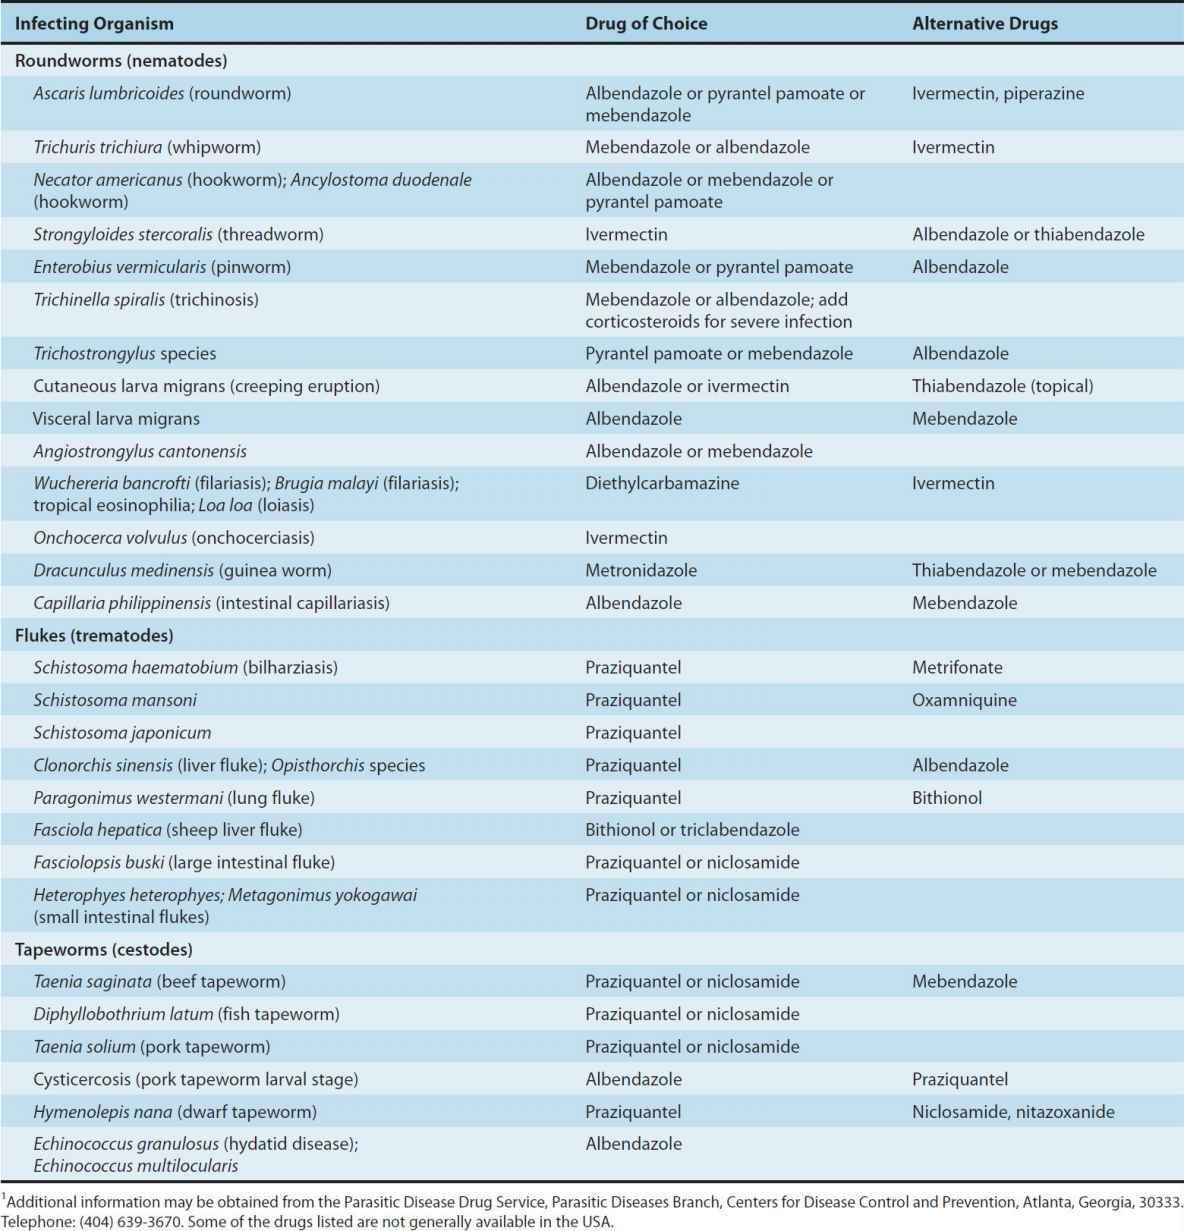 human papillomavirus dna positive neuroendocrine cancer stage 4